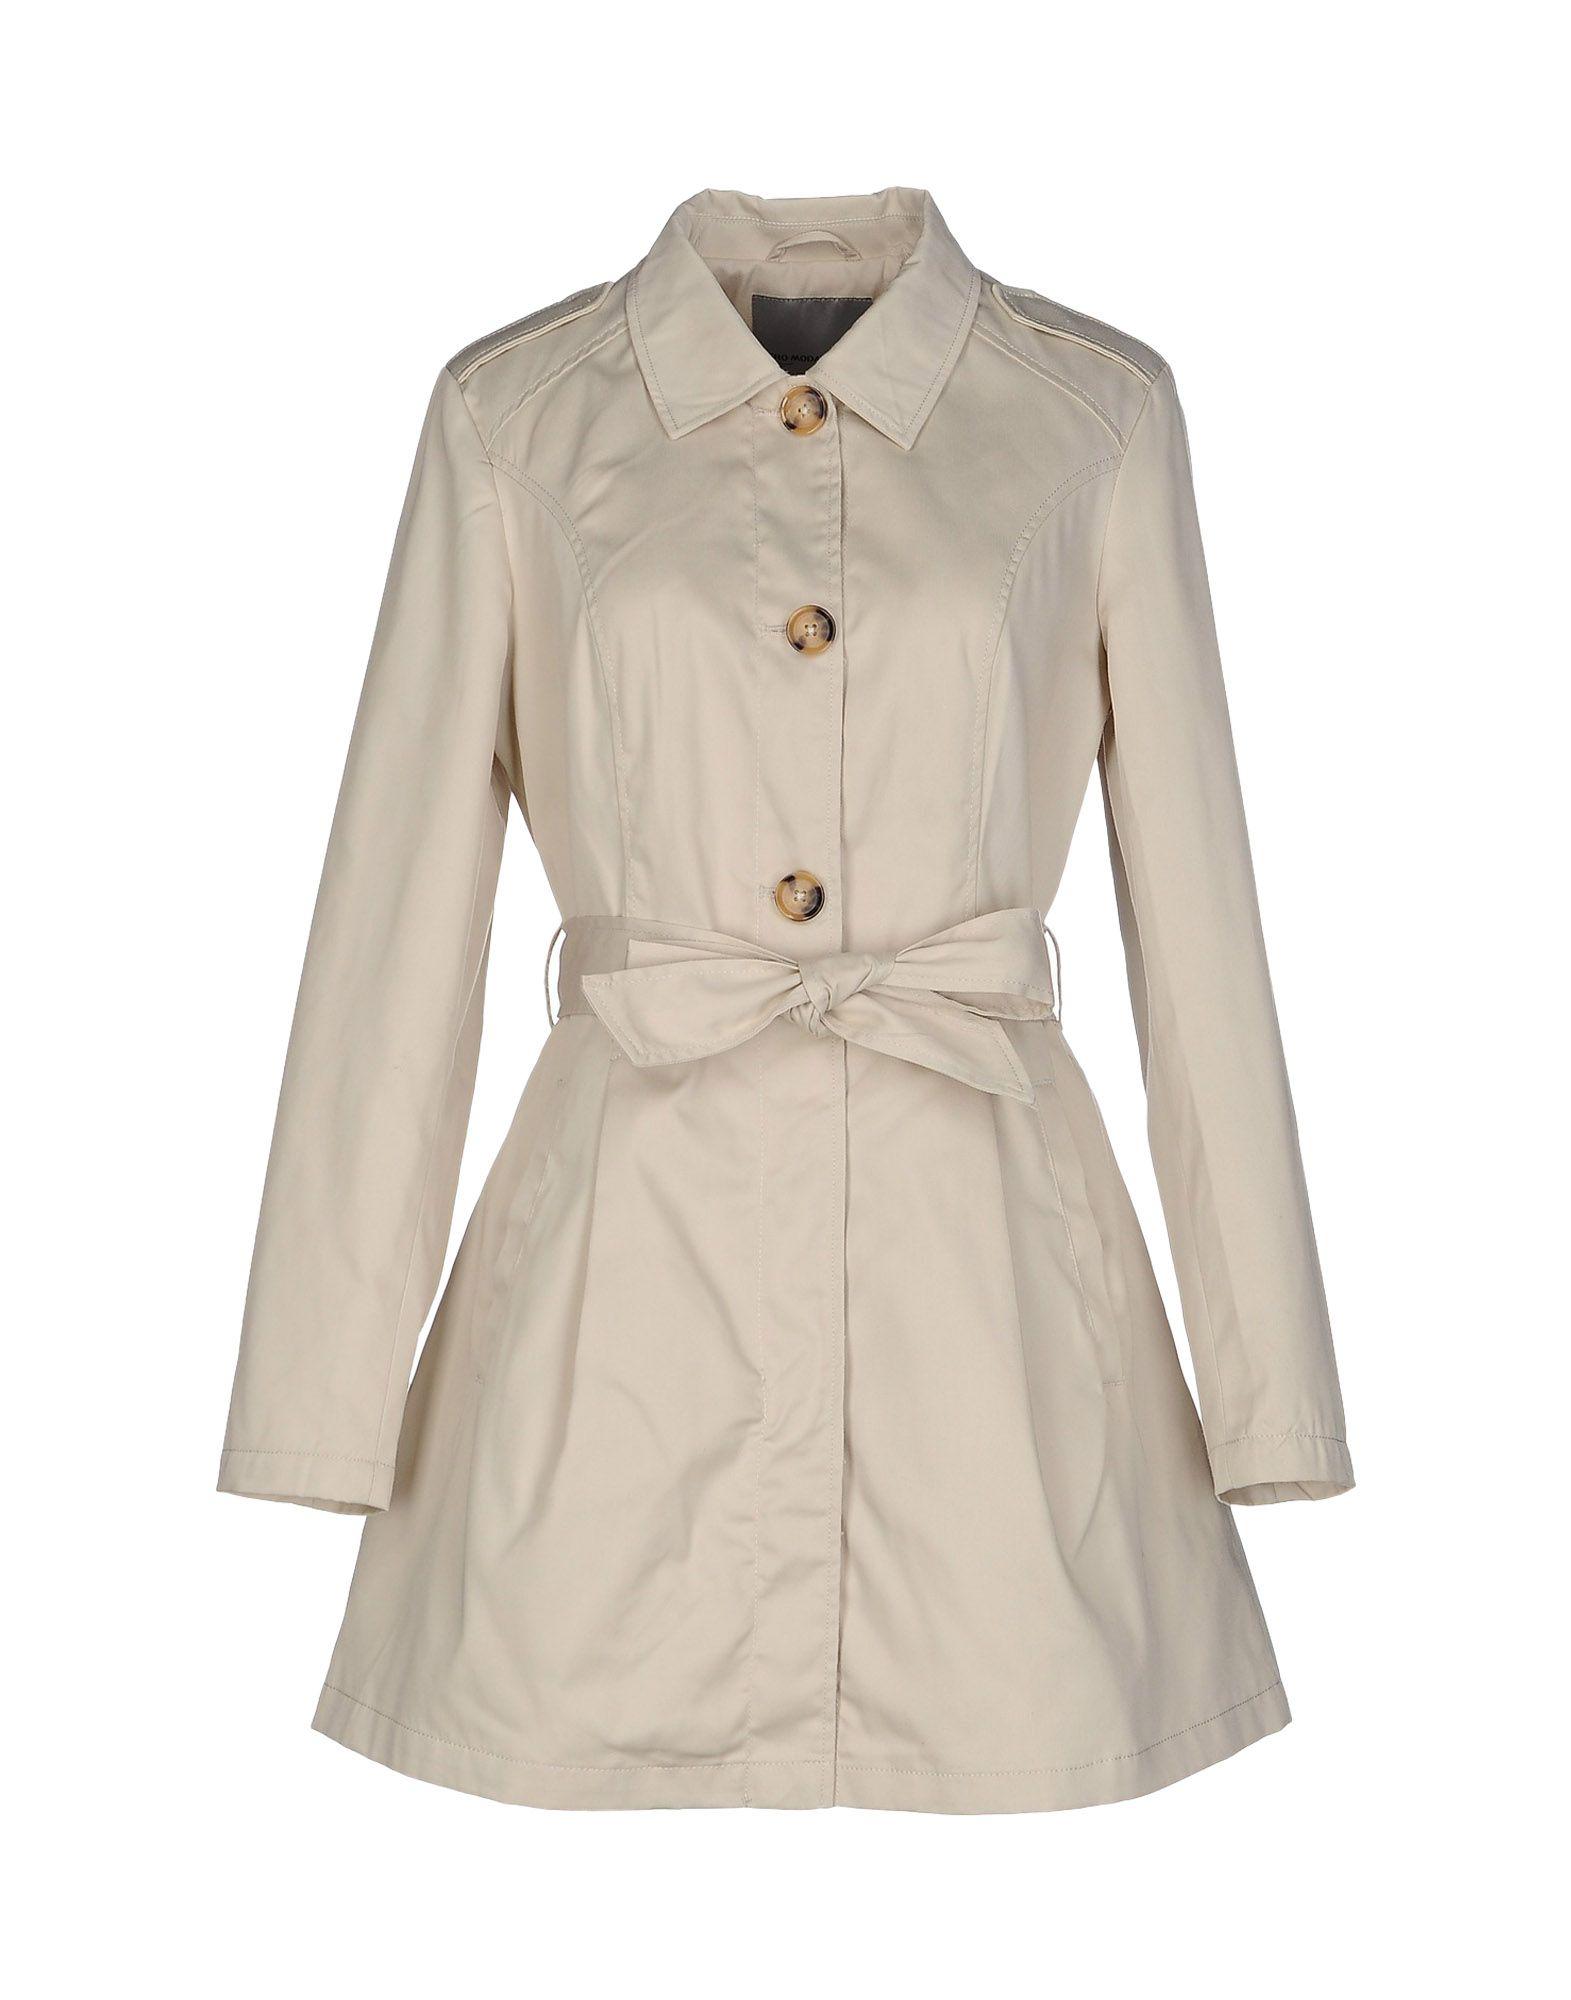 manteau femme vero moda jusqu 70 soldes deuxi me d marque. Black Bedroom Furniture Sets. Home Design Ideas